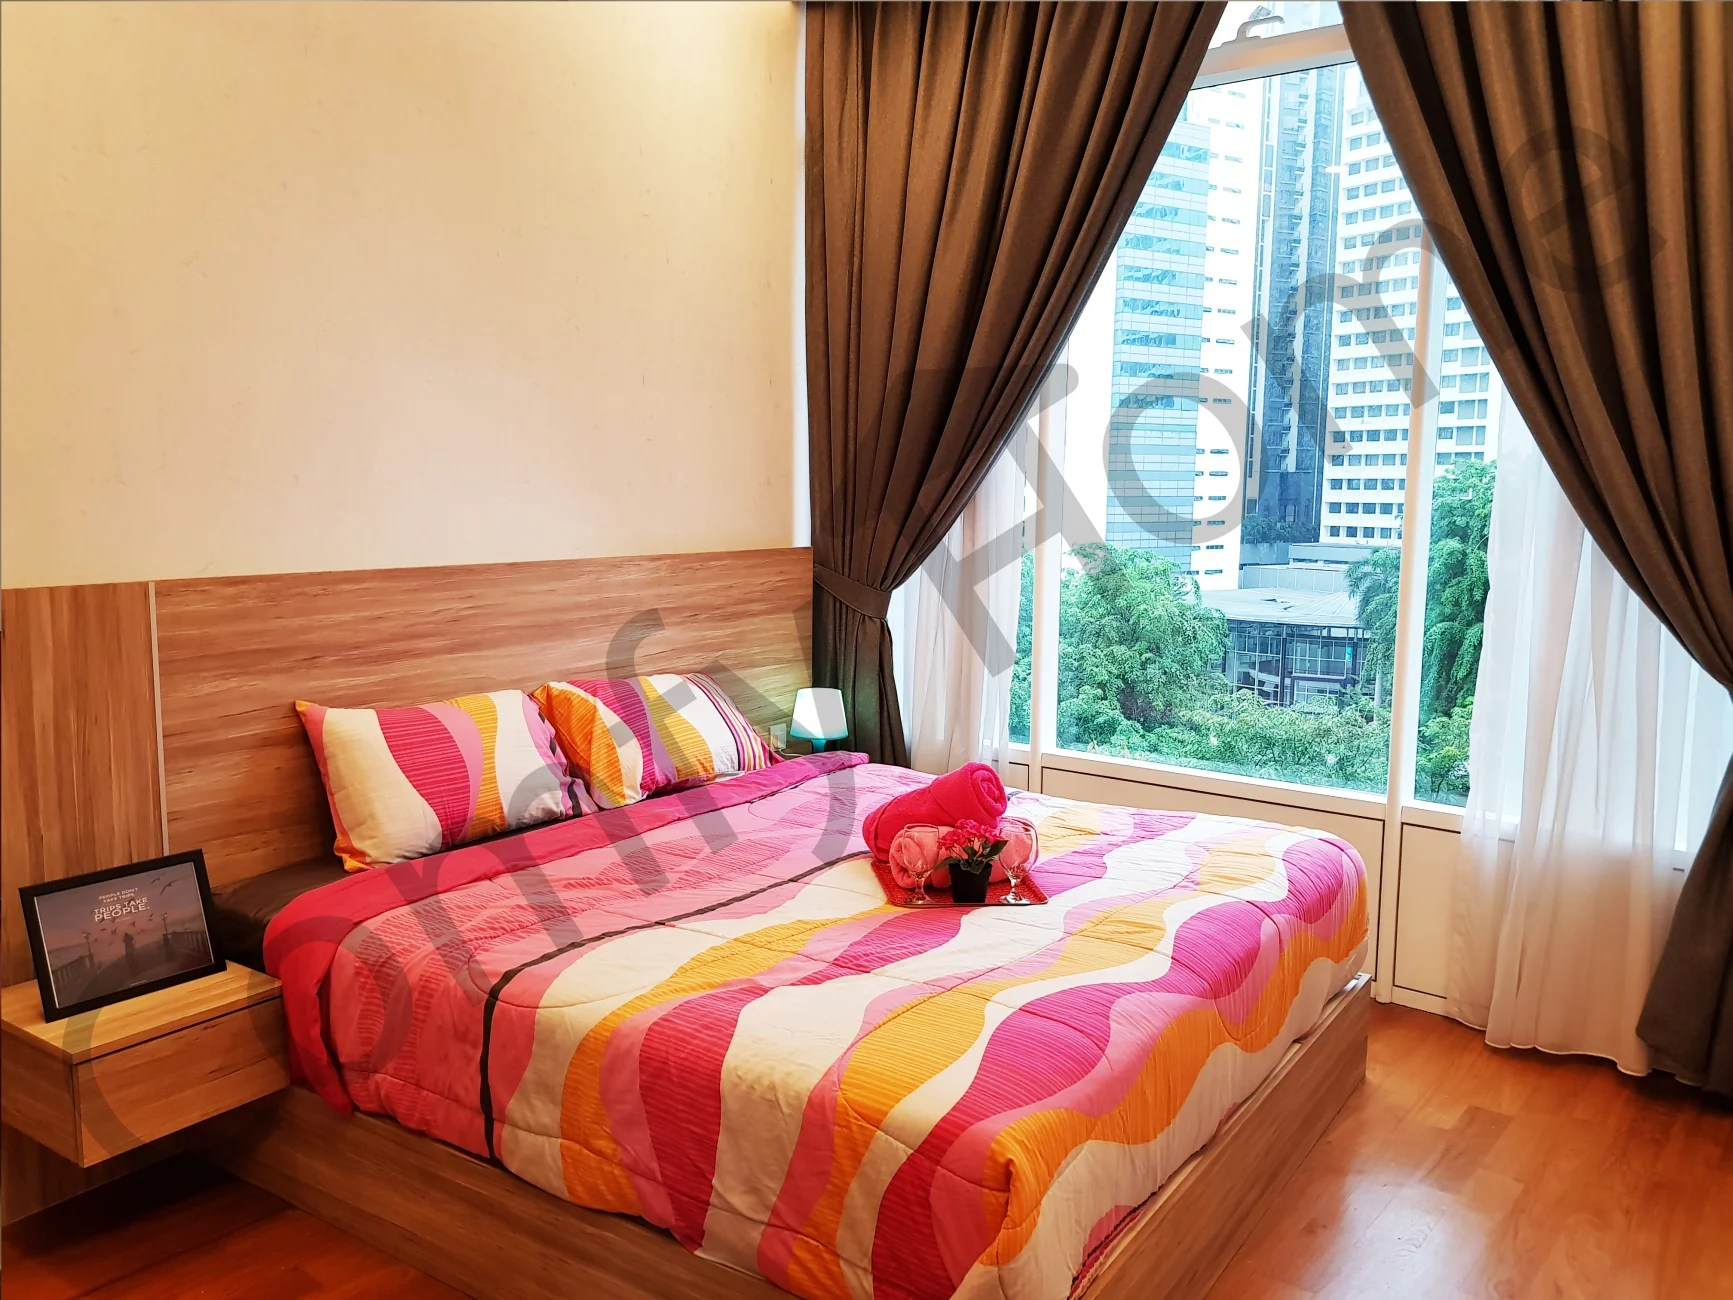 Rumah Apartemen 5 Star Luxury Apartment Near Klcc Kl